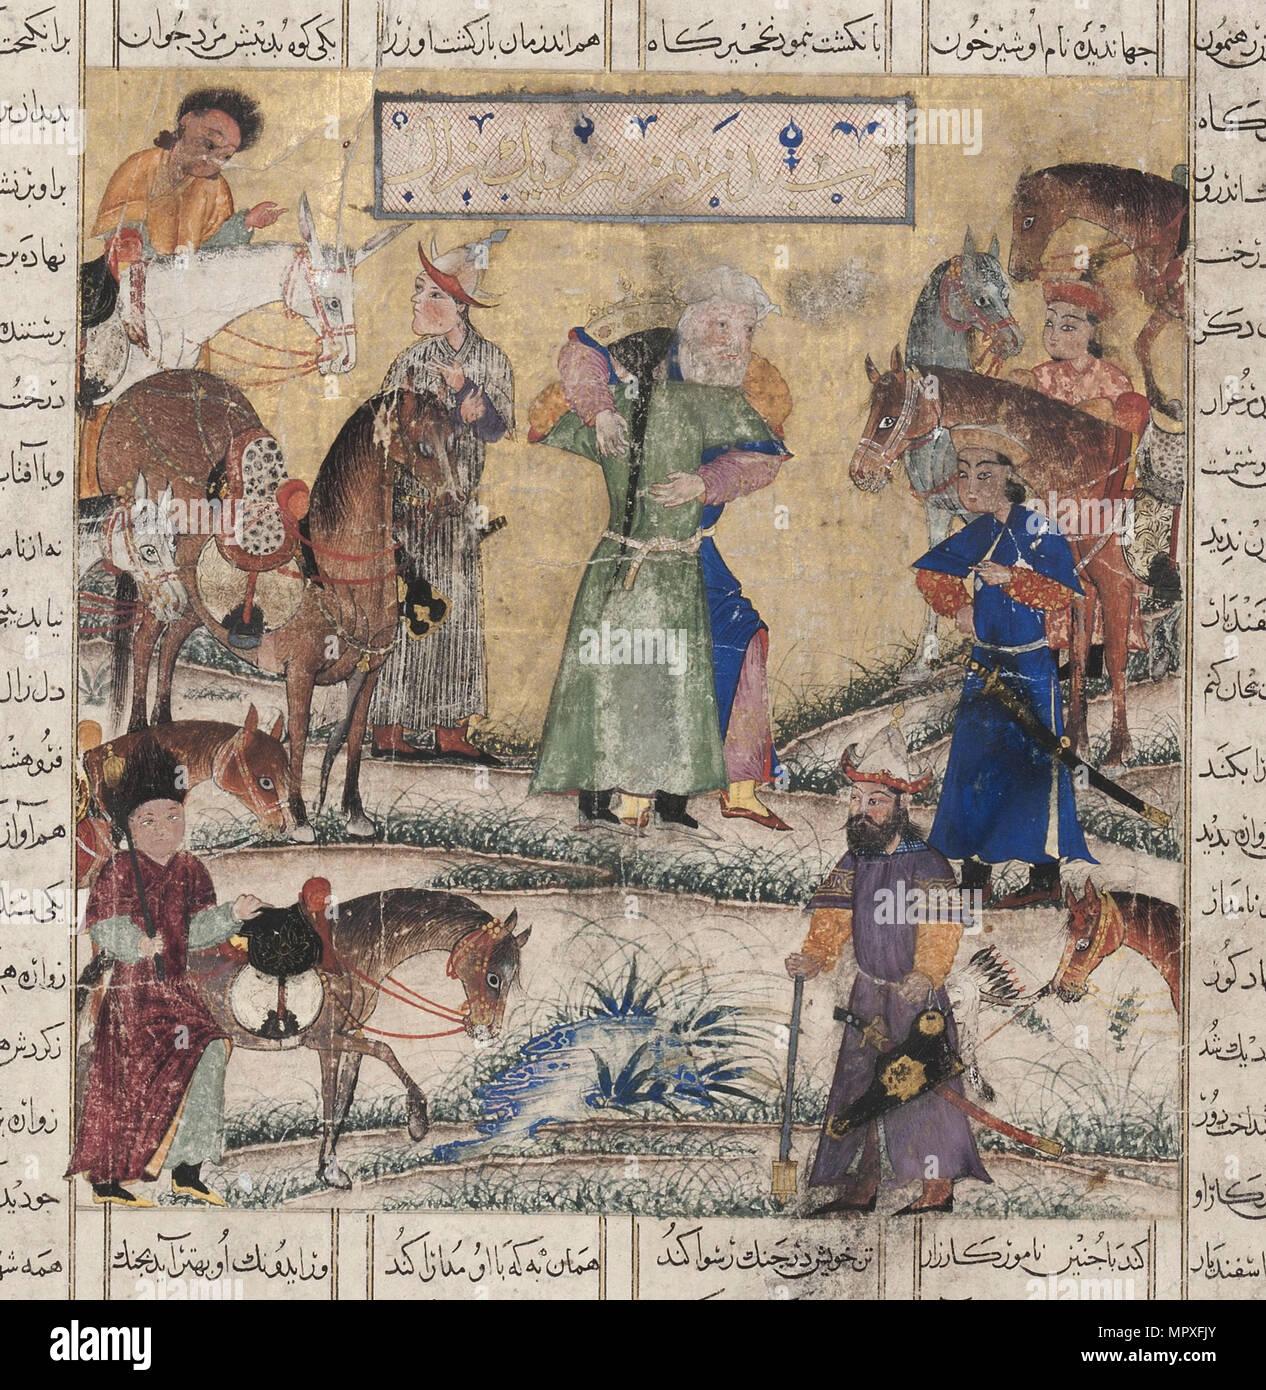 Bahman meets Zal. From the Shahnama (Book of Kings), 1335-1340. - Stock Image